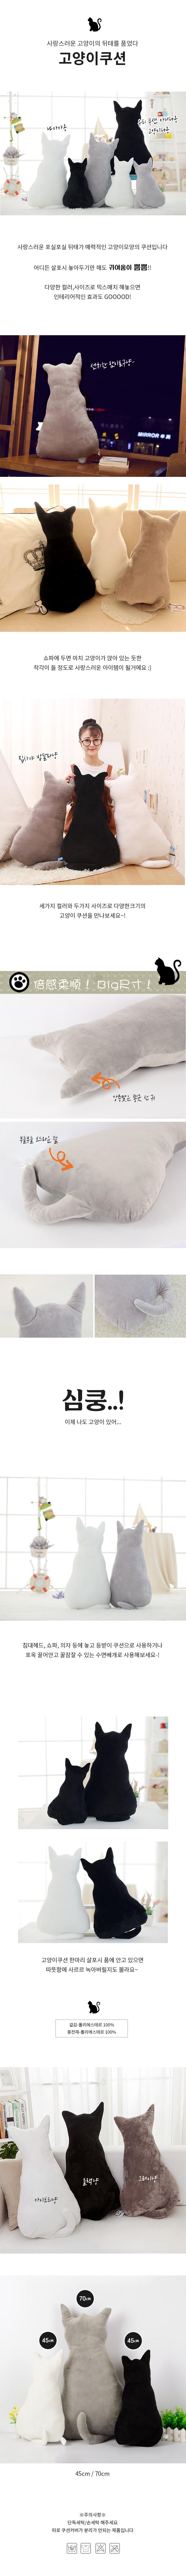 3Color 예쁜쿠션 고양이인형 거실쇼파인테리어 - 갓샵, 4,800원, 쿠션, 무지/솔리드